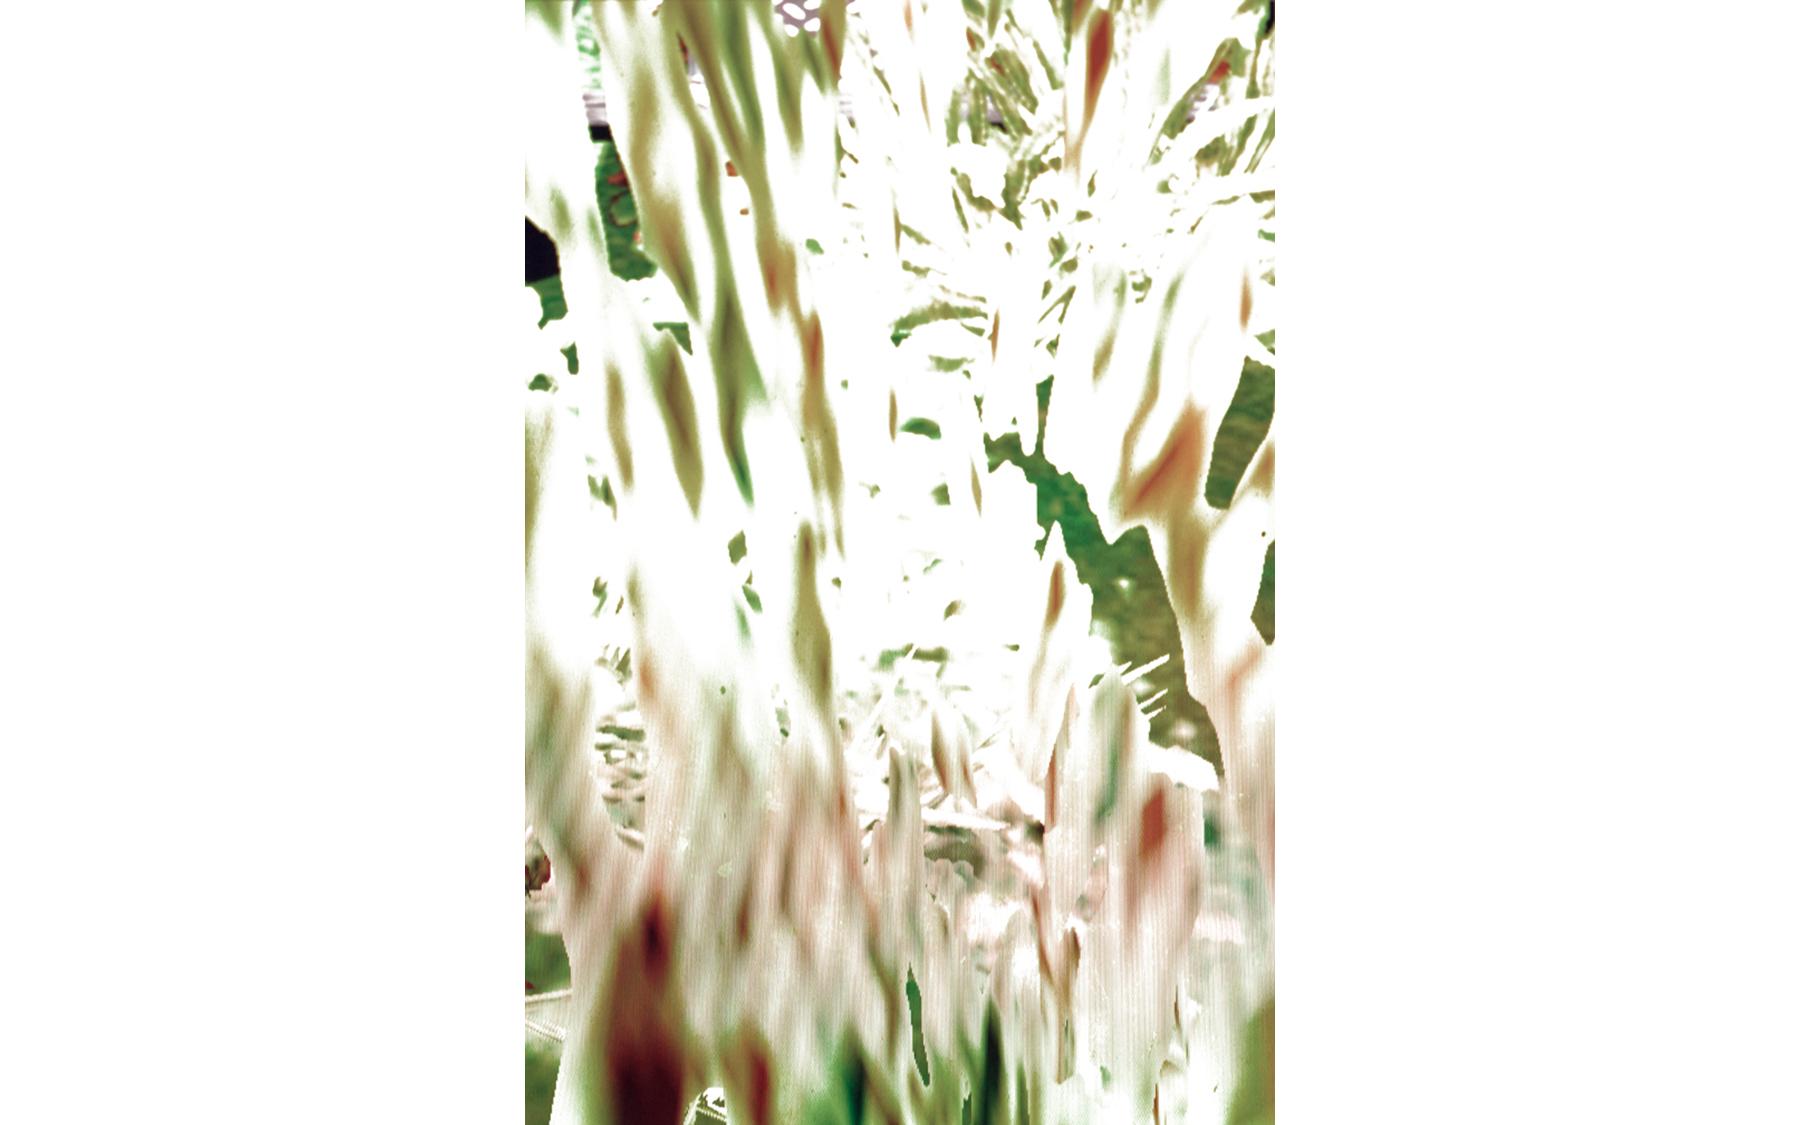 Peeling Grass , 2016 archival inkjet print image size: 22 x 17''